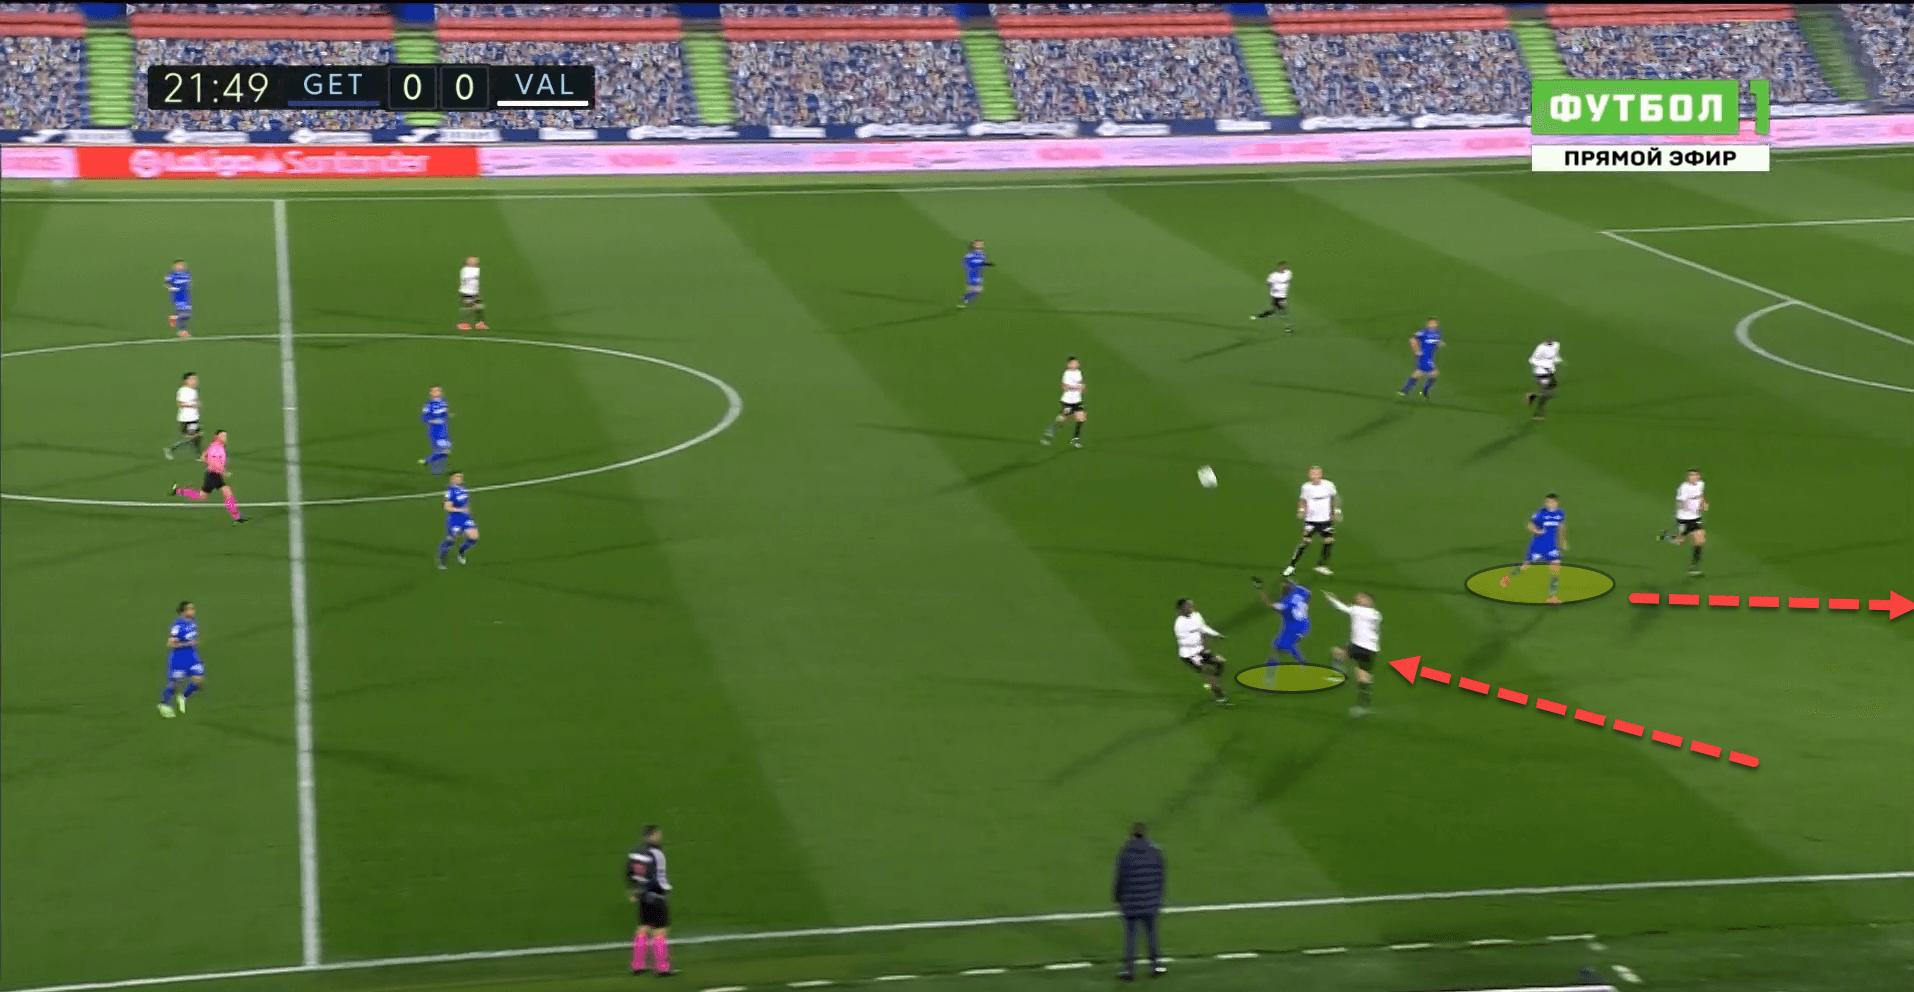 Valencia's vindication: Will Jose Bordalas be a success at the Estadio Mestalla after a tough La Liga season? – tactical analysis